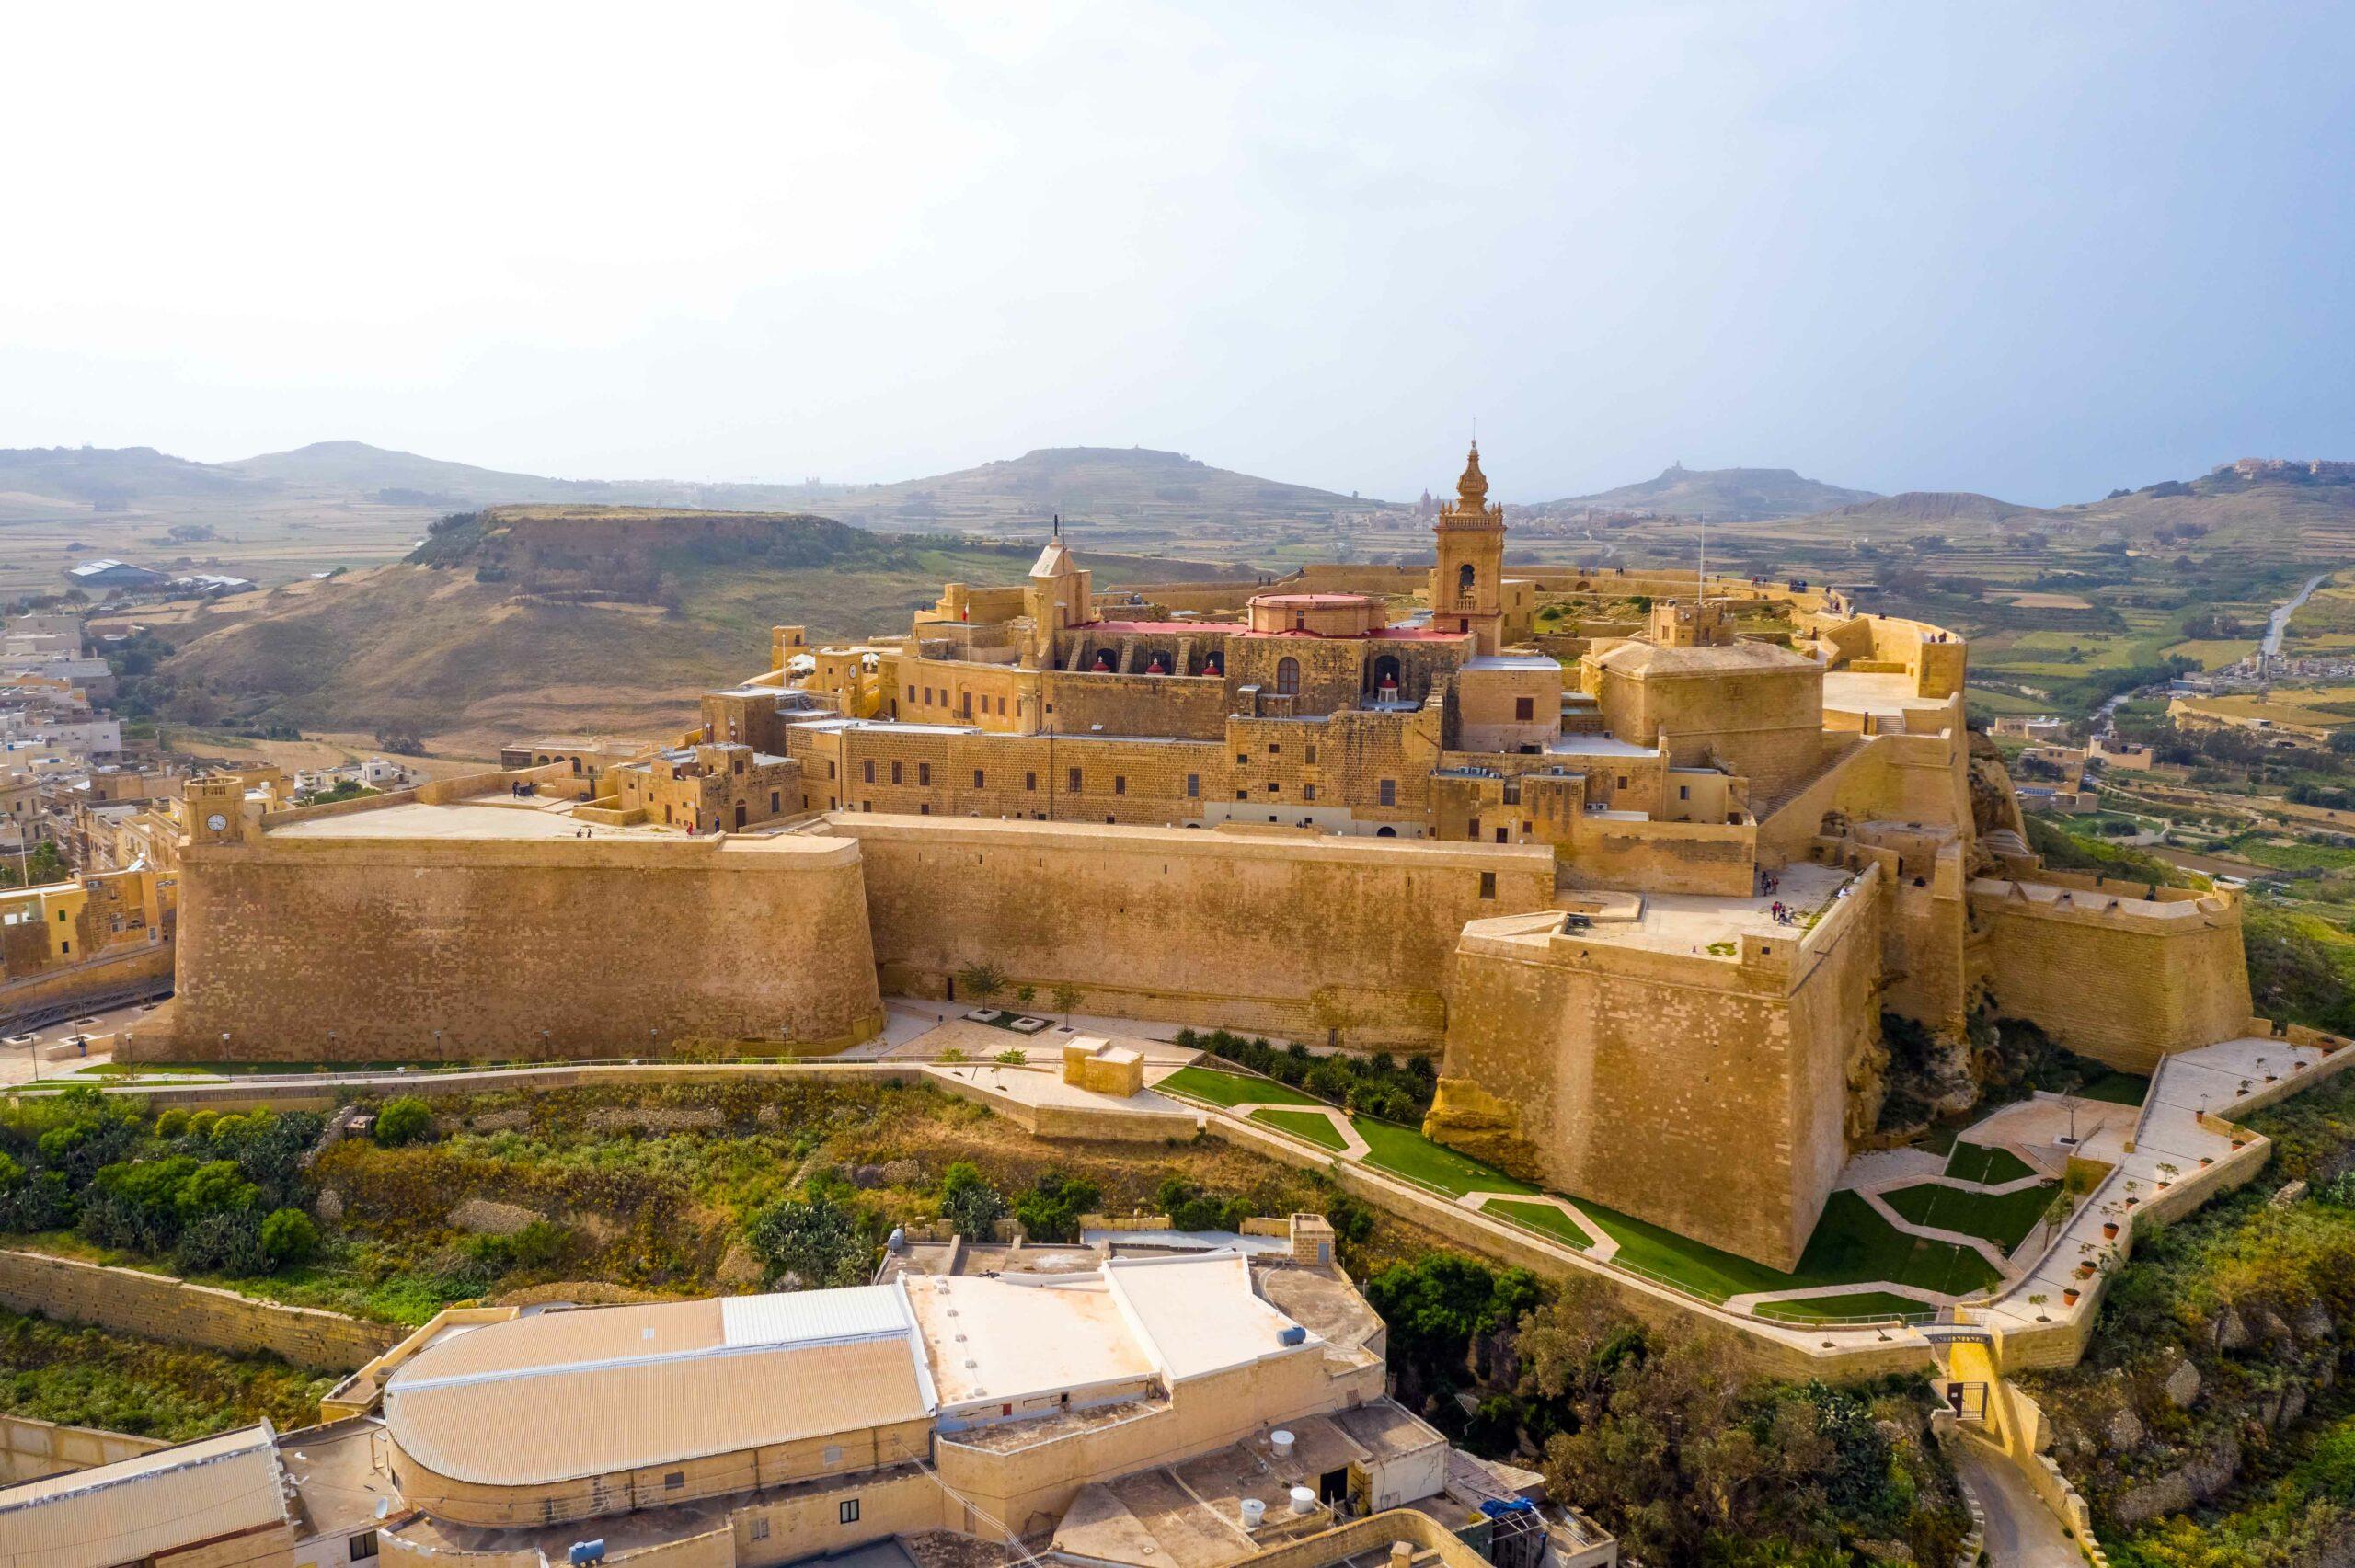 Canva---Citadel-in-Victoria-city-(Rabat)---capital-of-Gozo-island.-Malta-country